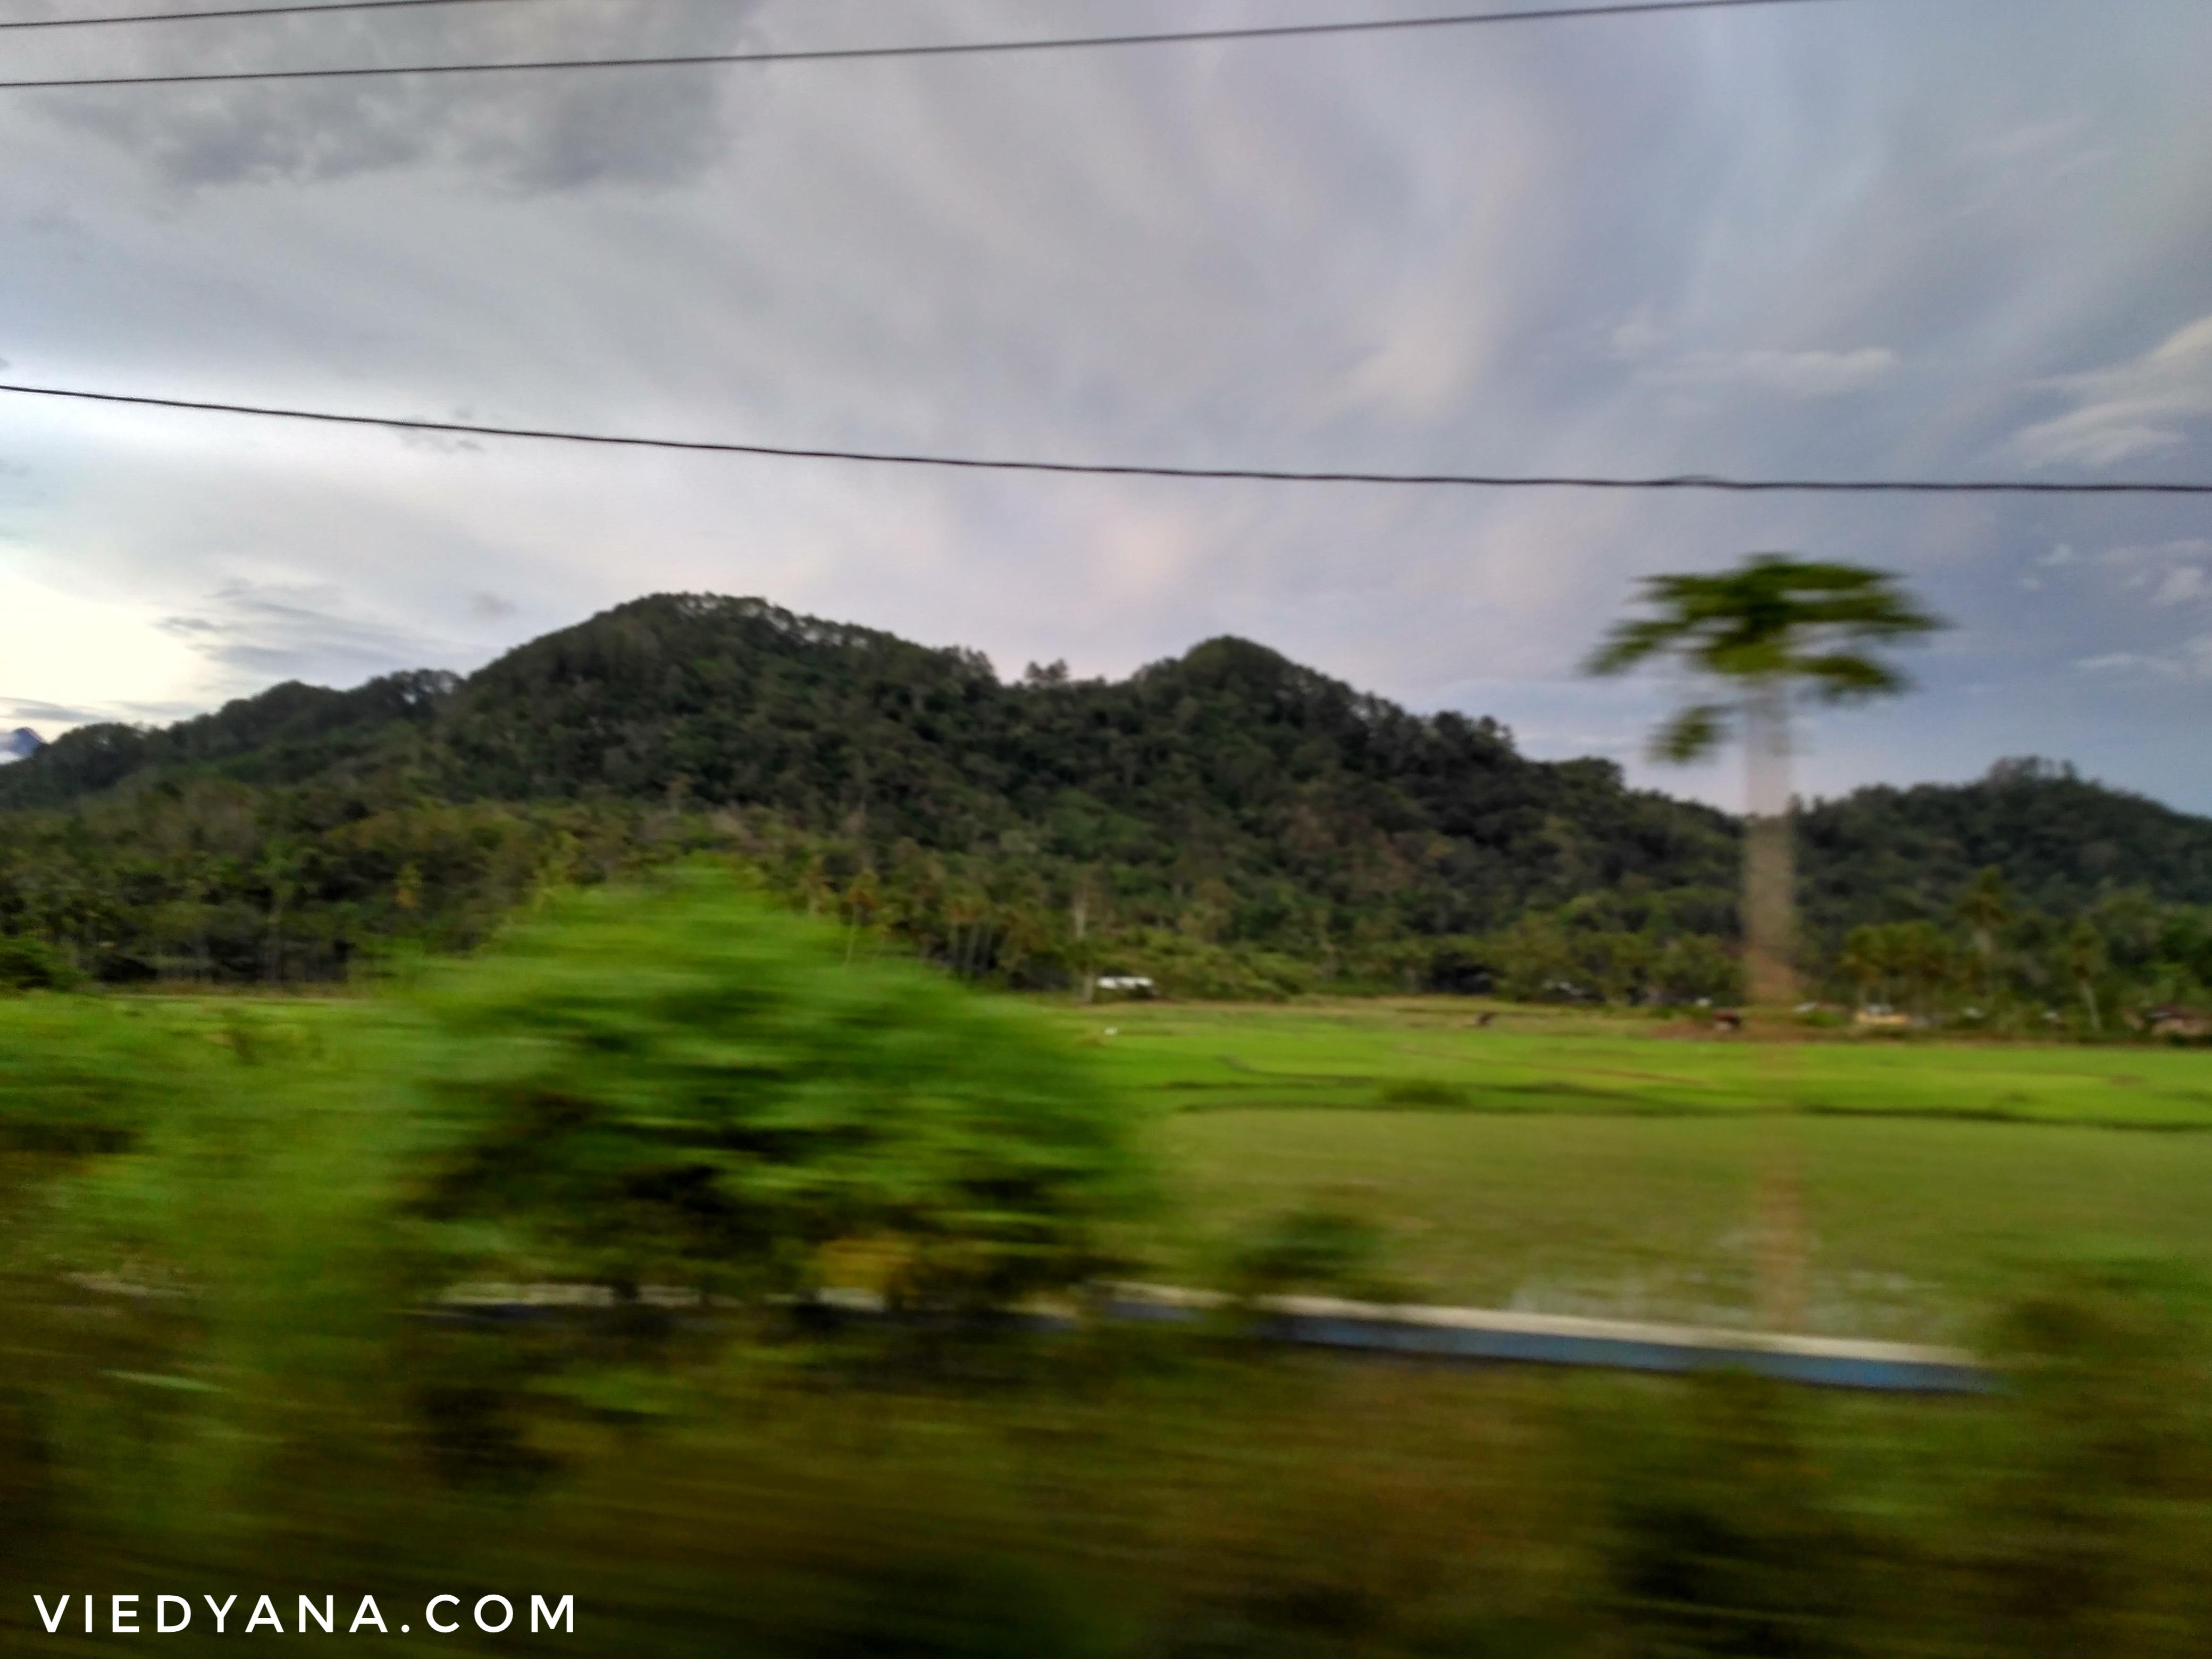 RoadTripMbokJastra# 5: (Merasa) Salah Jalan di Jalan Berliku Yang Ciamik